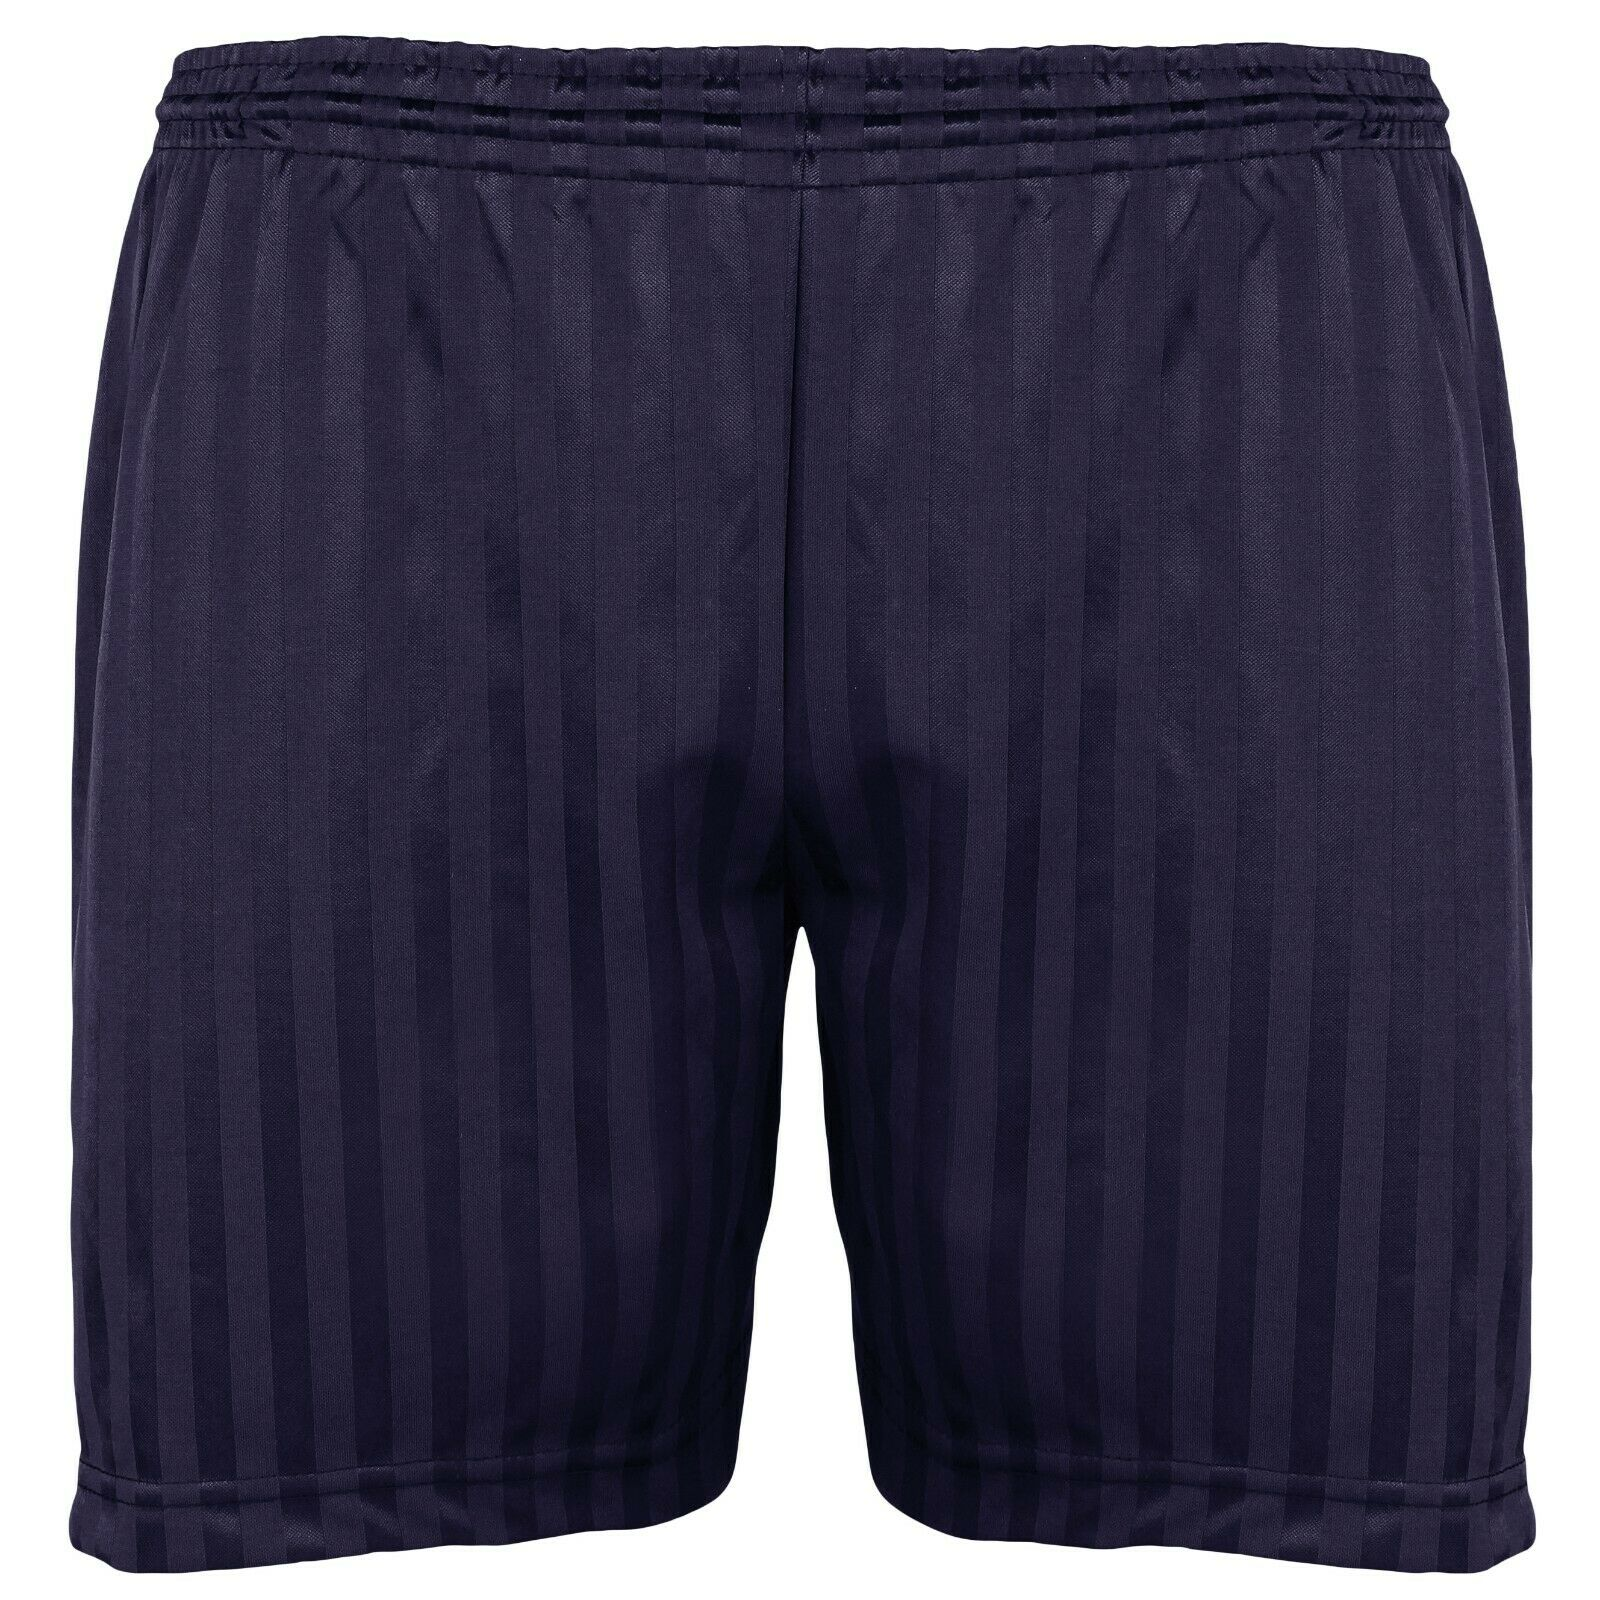 A2Z 4 Kids/® Shadow Stripe PE Shorts Boys Girls Unisex Sports Football Gym School Short New Age 2 3 4 5 6 7 8 9 10 11 12 13 Years